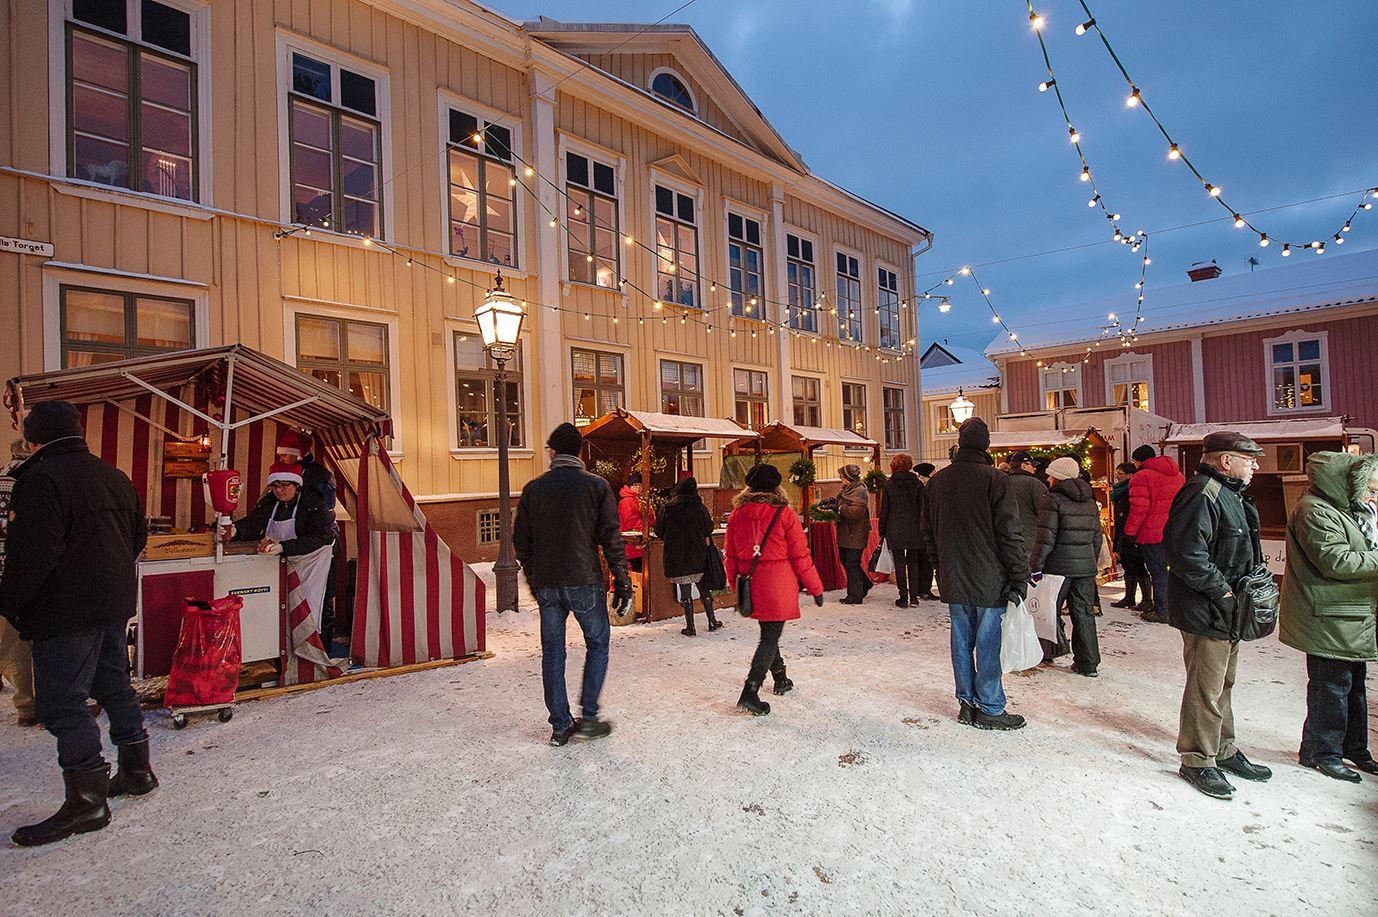 Johan Lindqvist,  © Johan Lindqvist, Eksjö Christmas Market